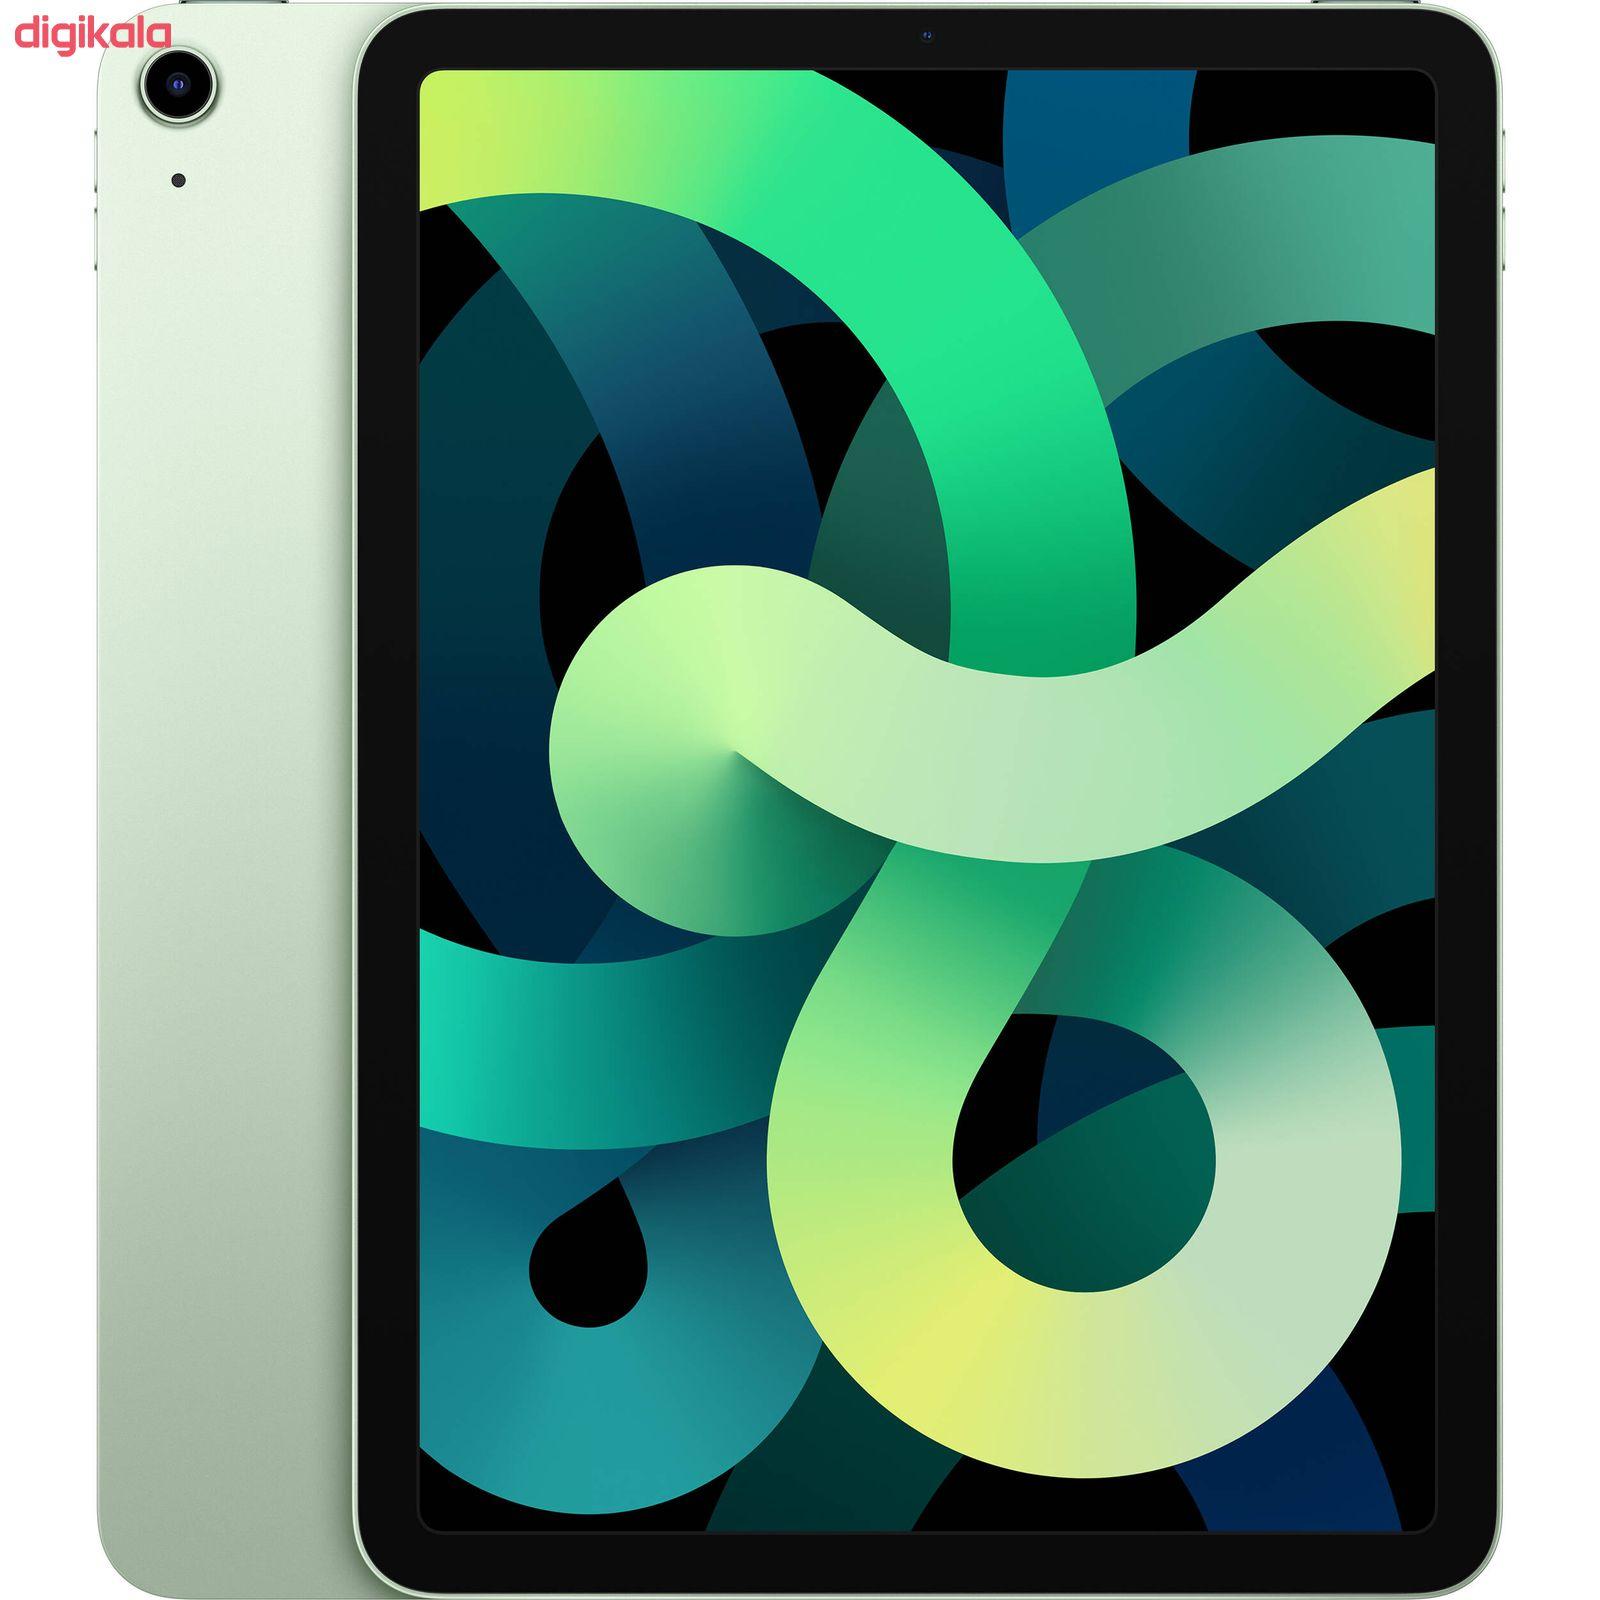 تبلت اپل مدل iPad Air 10.9 inch 2020 WiFi ظرفیت 64 گیگابایت  main 1 7